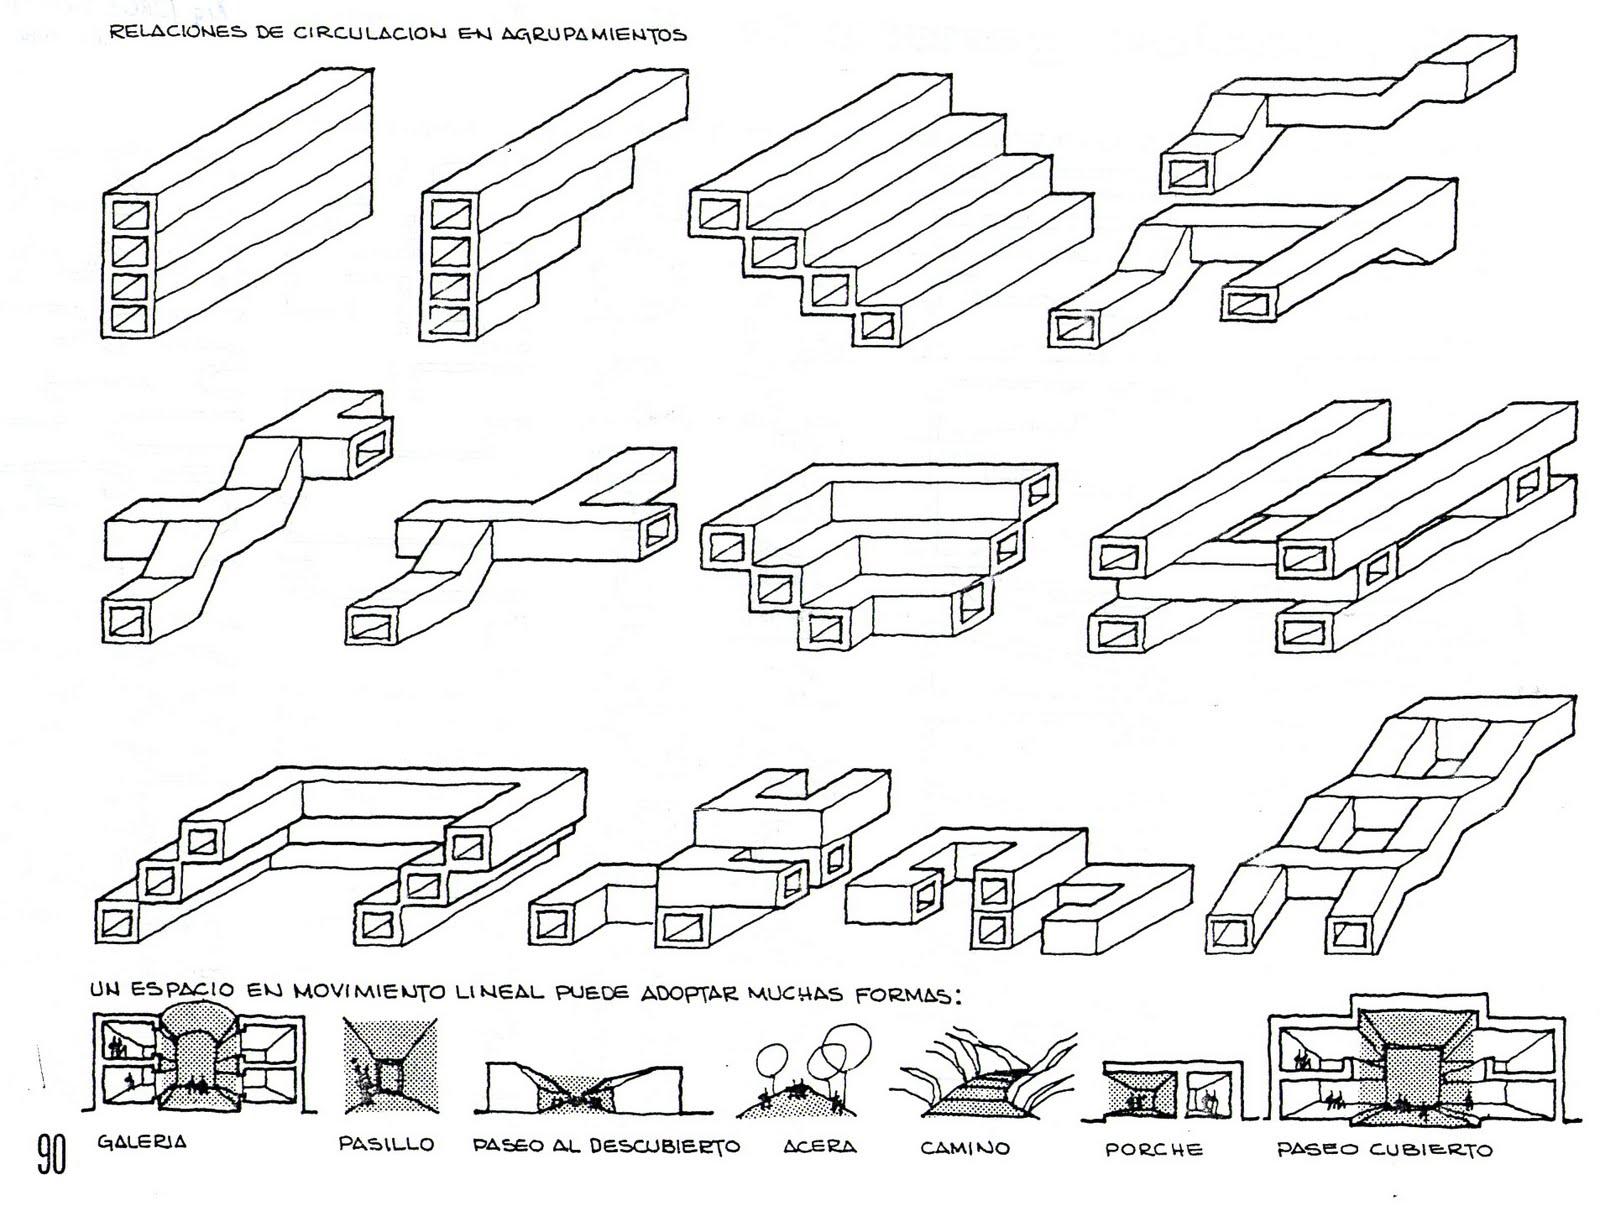 Taller josima 1 disfrutando la composici n espacial for Libros sobre planos arquitectonicos